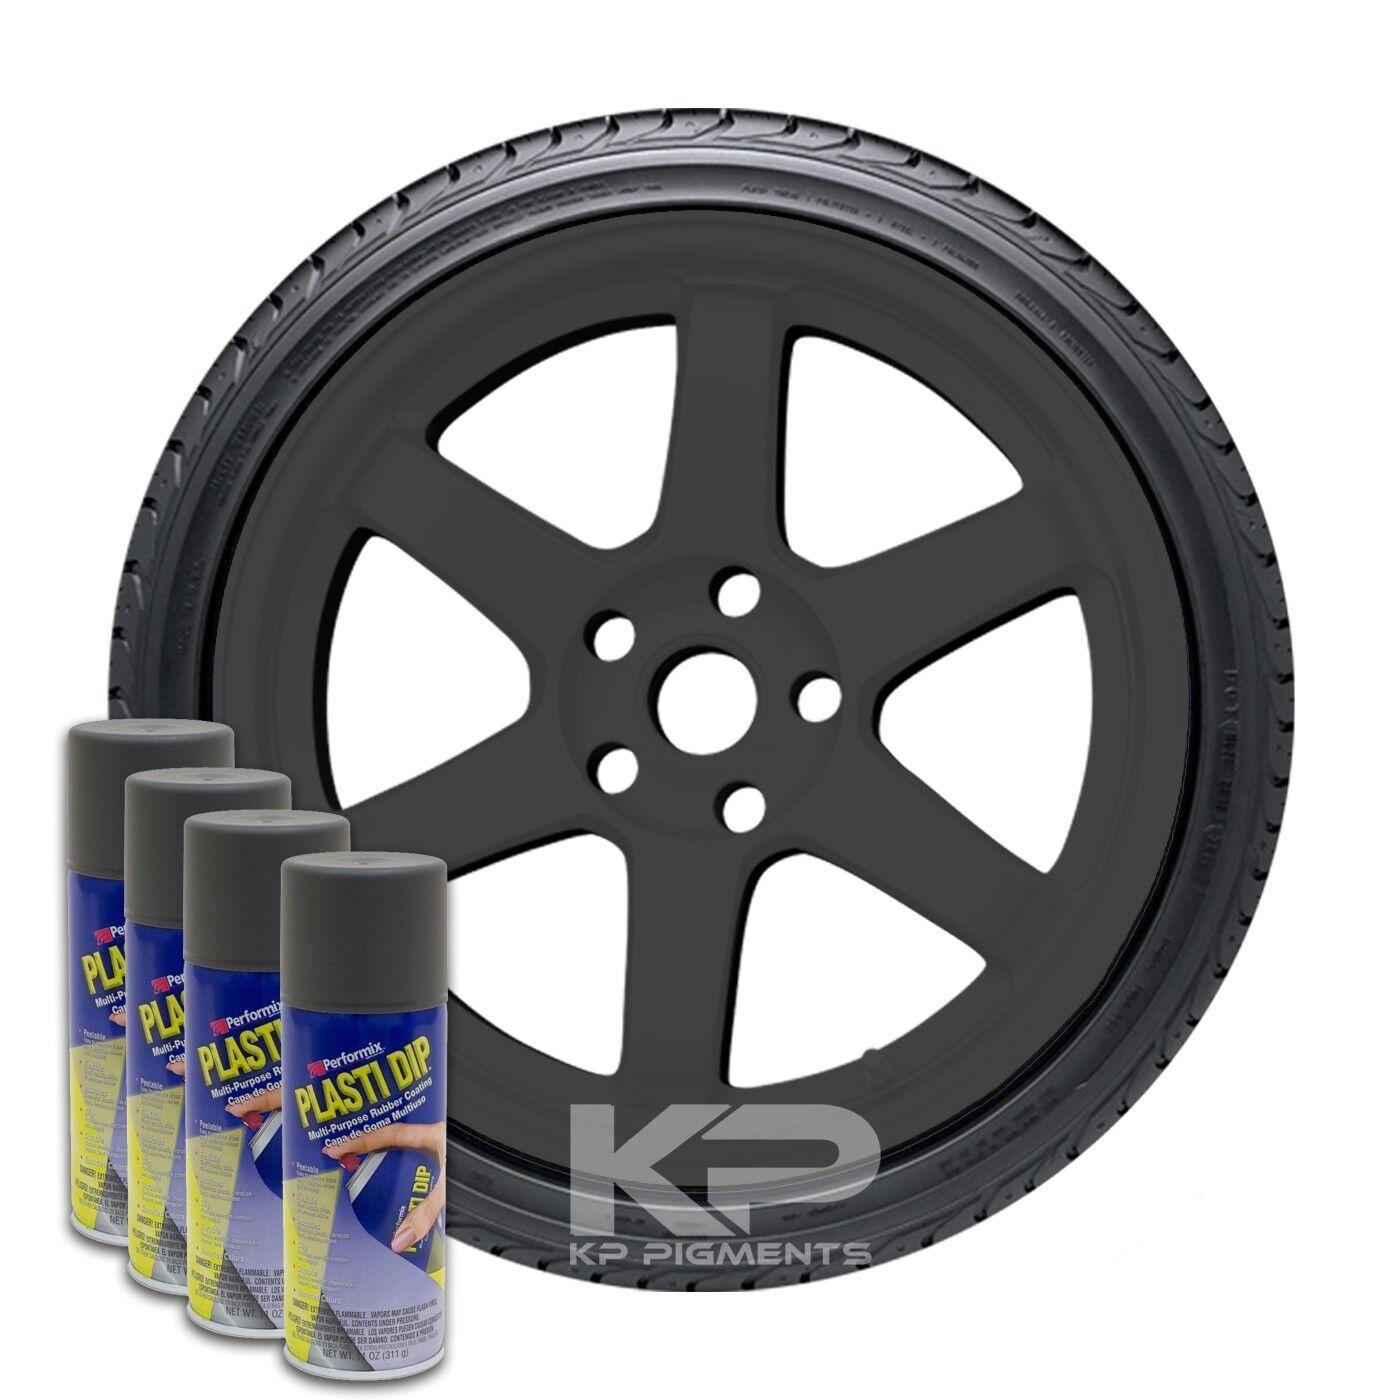 Plasti Dip Spray Aerosol Cans Wheel Rim Kit Gun Metal Grey 4 Pack 11oz - $35.99